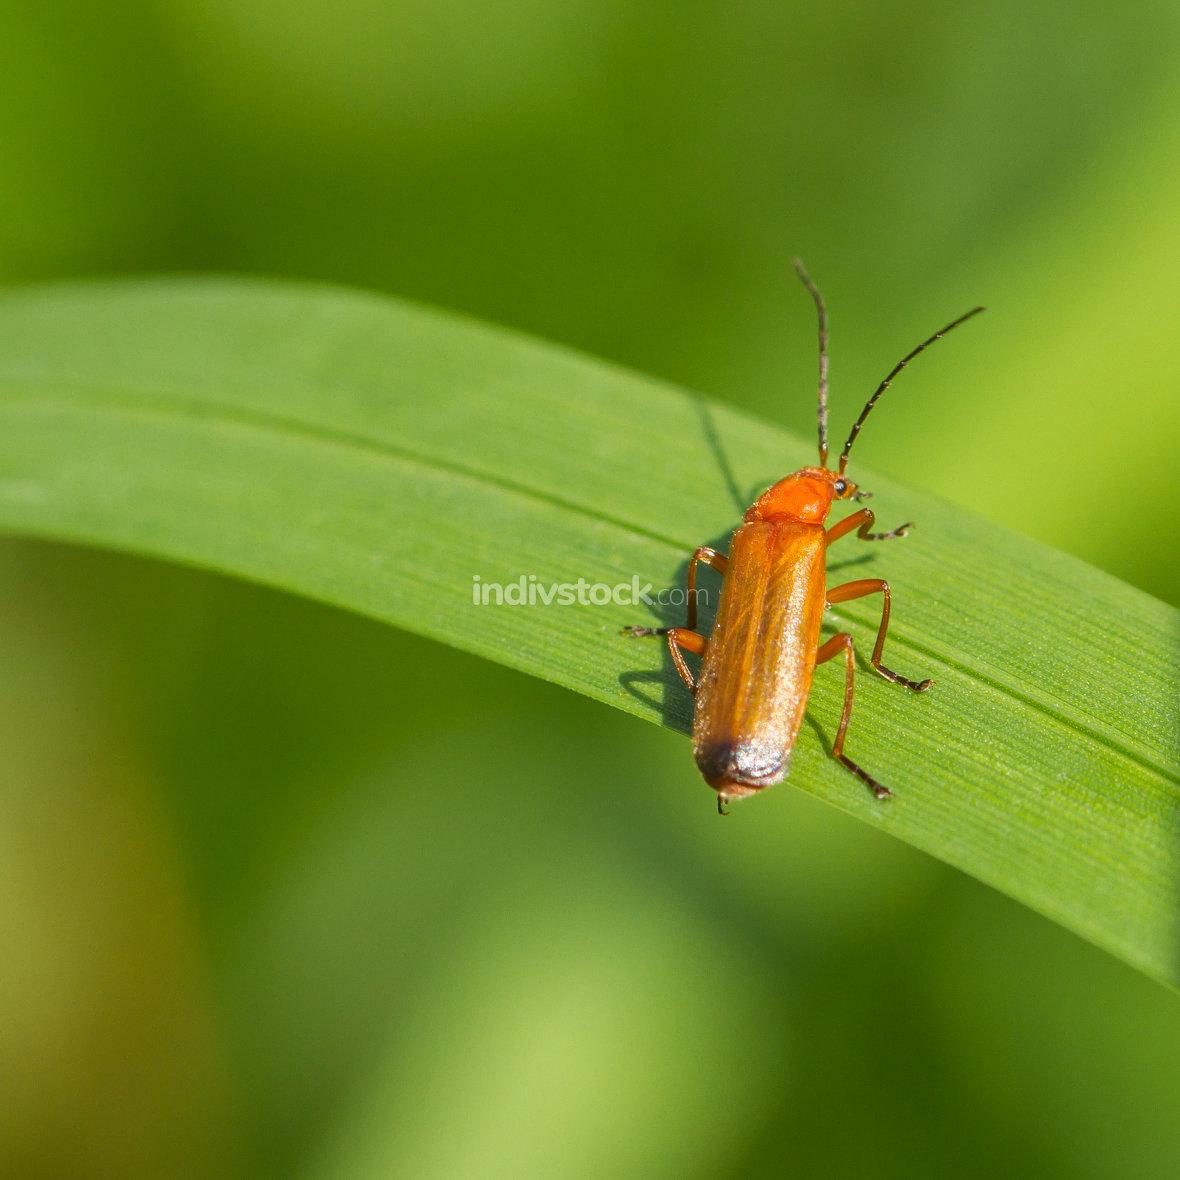 Beetle Rhagonycha fulva